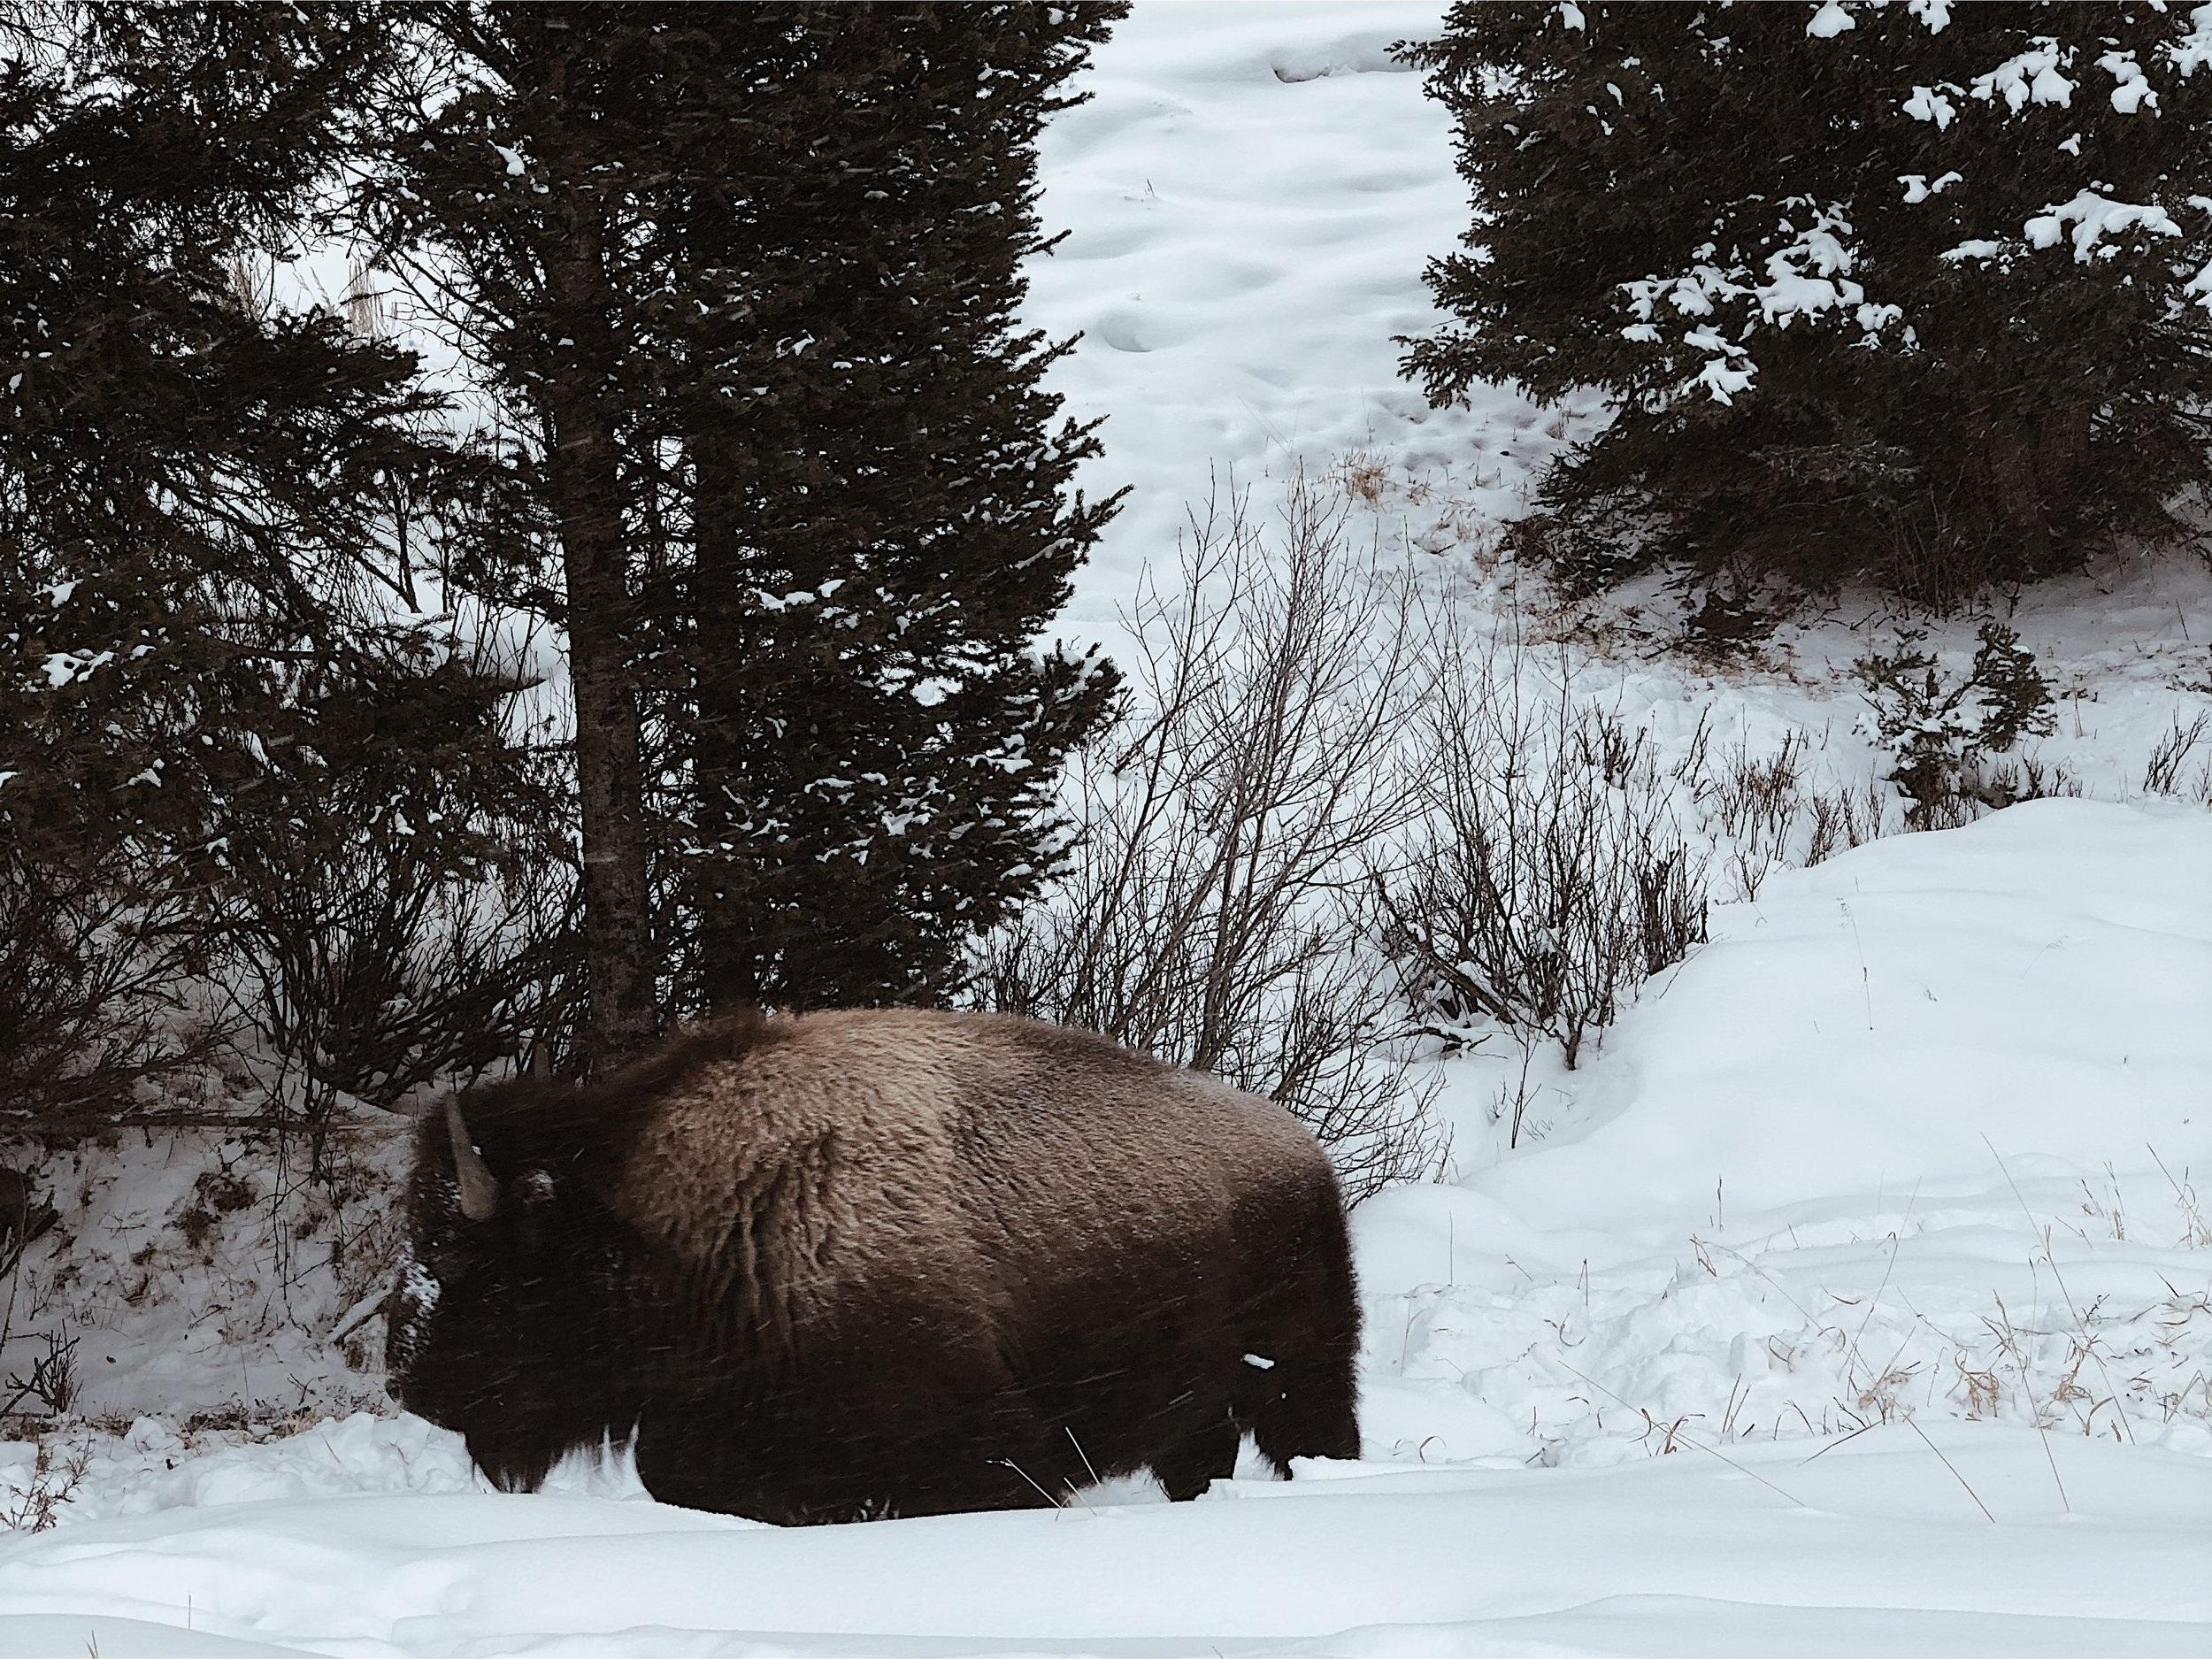 yellowstone_bison.jpg